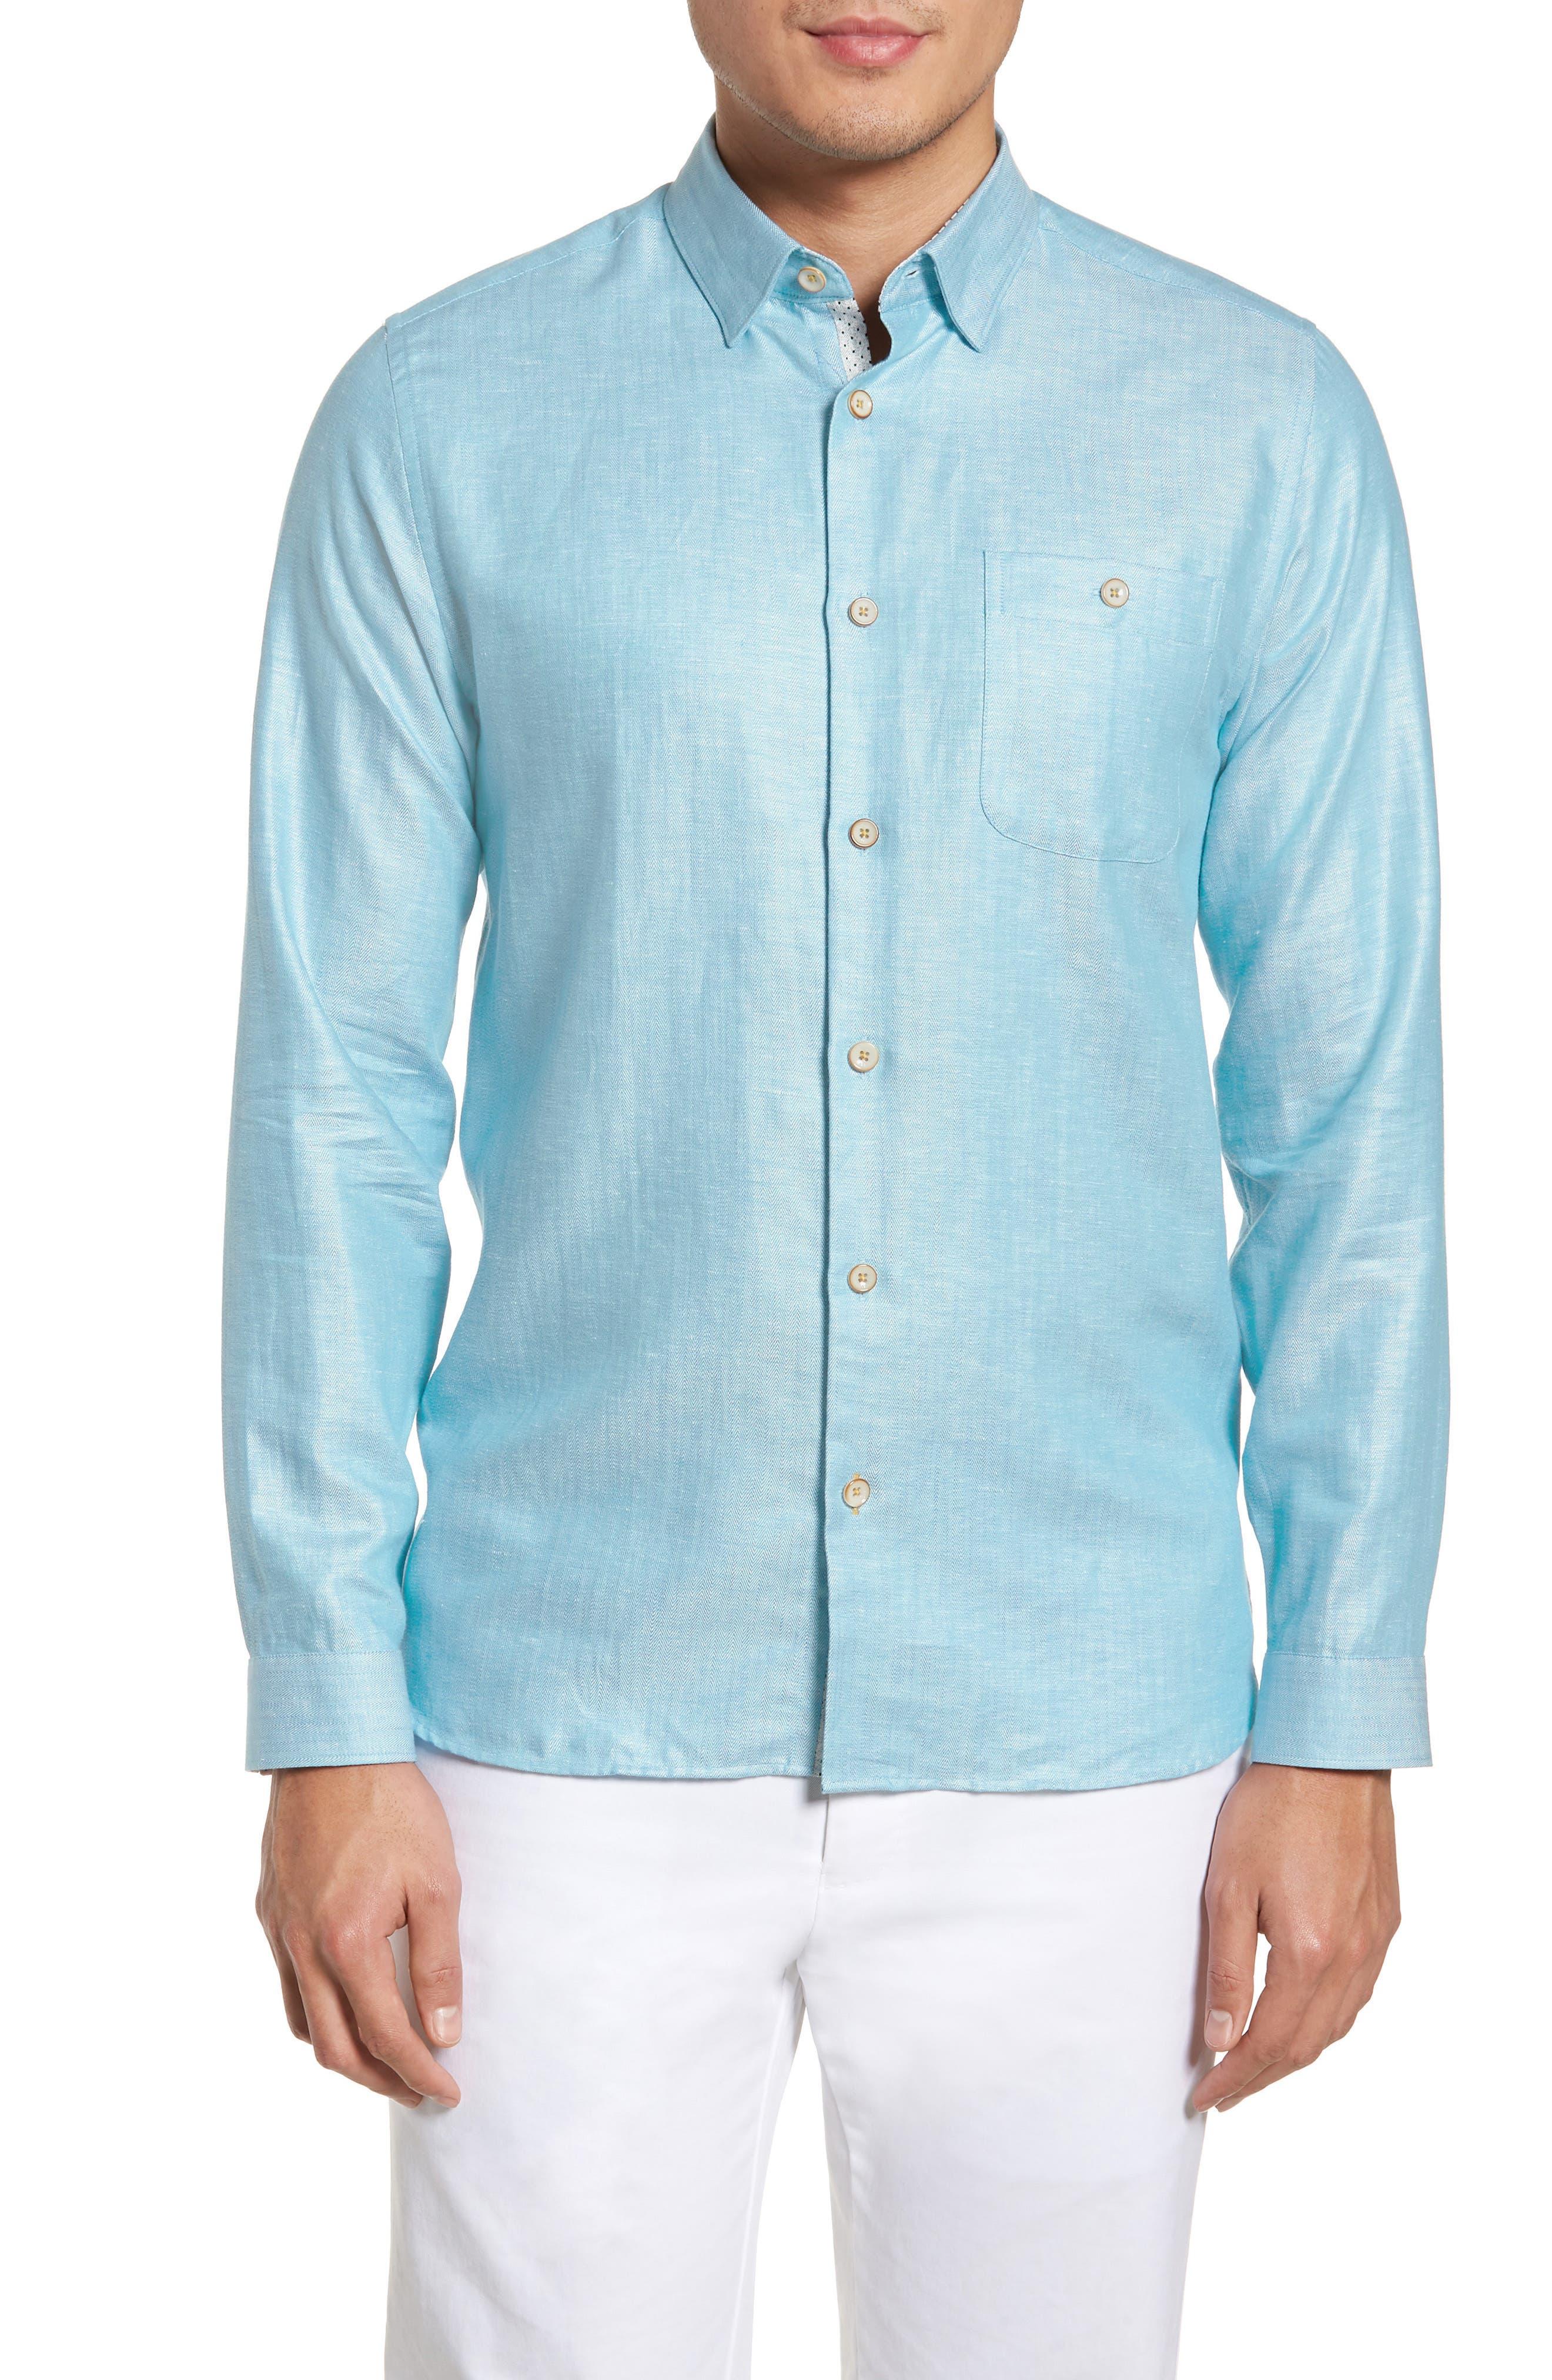 Linlins Herringbone Cotton & Linen Sport Shirt,                             Main thumbnail 4, color,